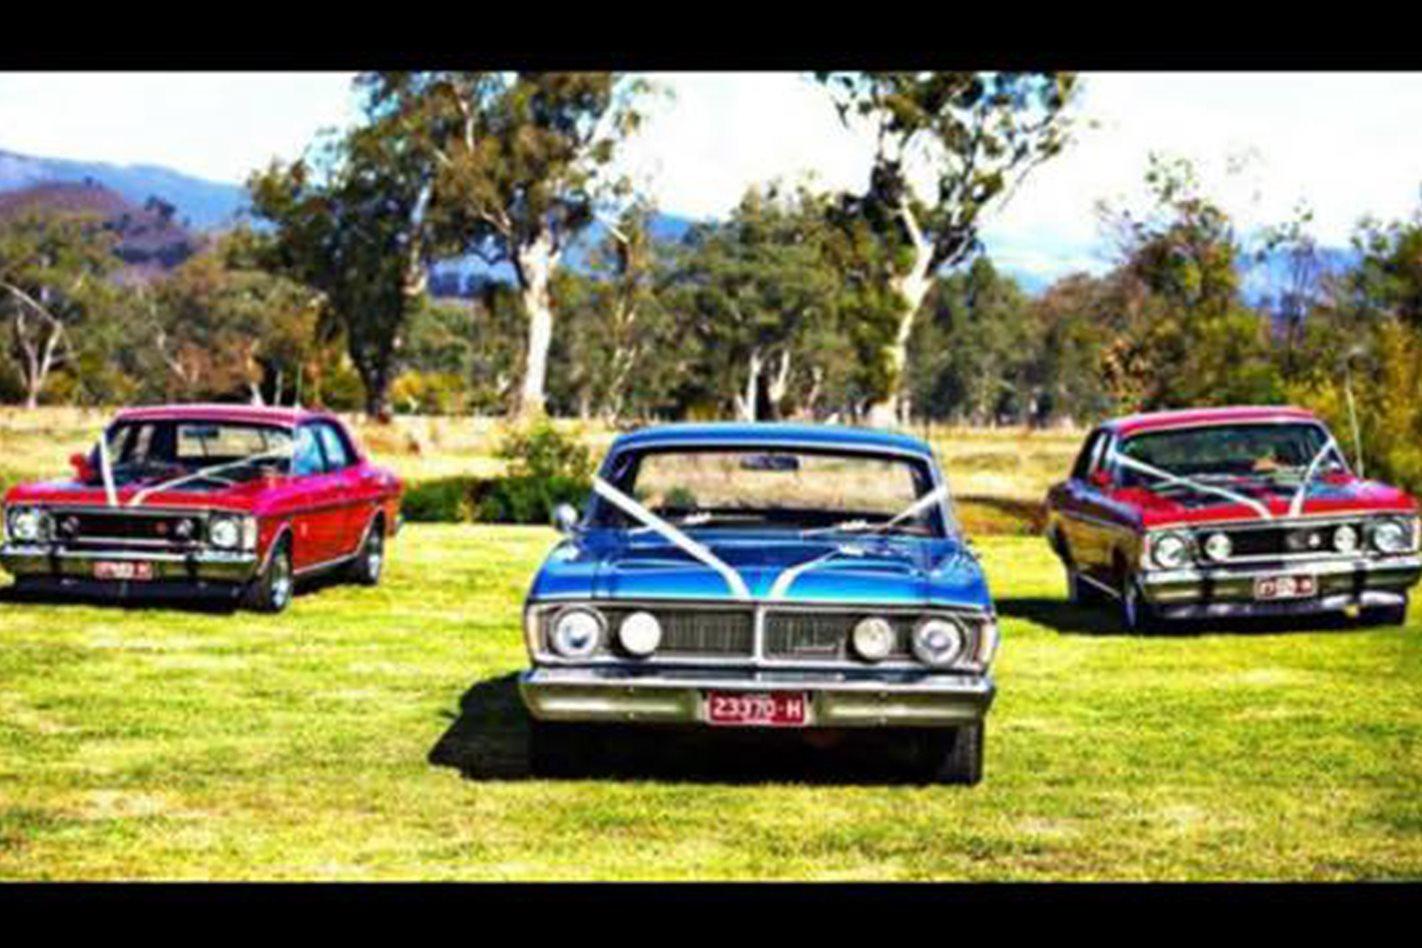 Dale Penjin's Falcon wedding cars